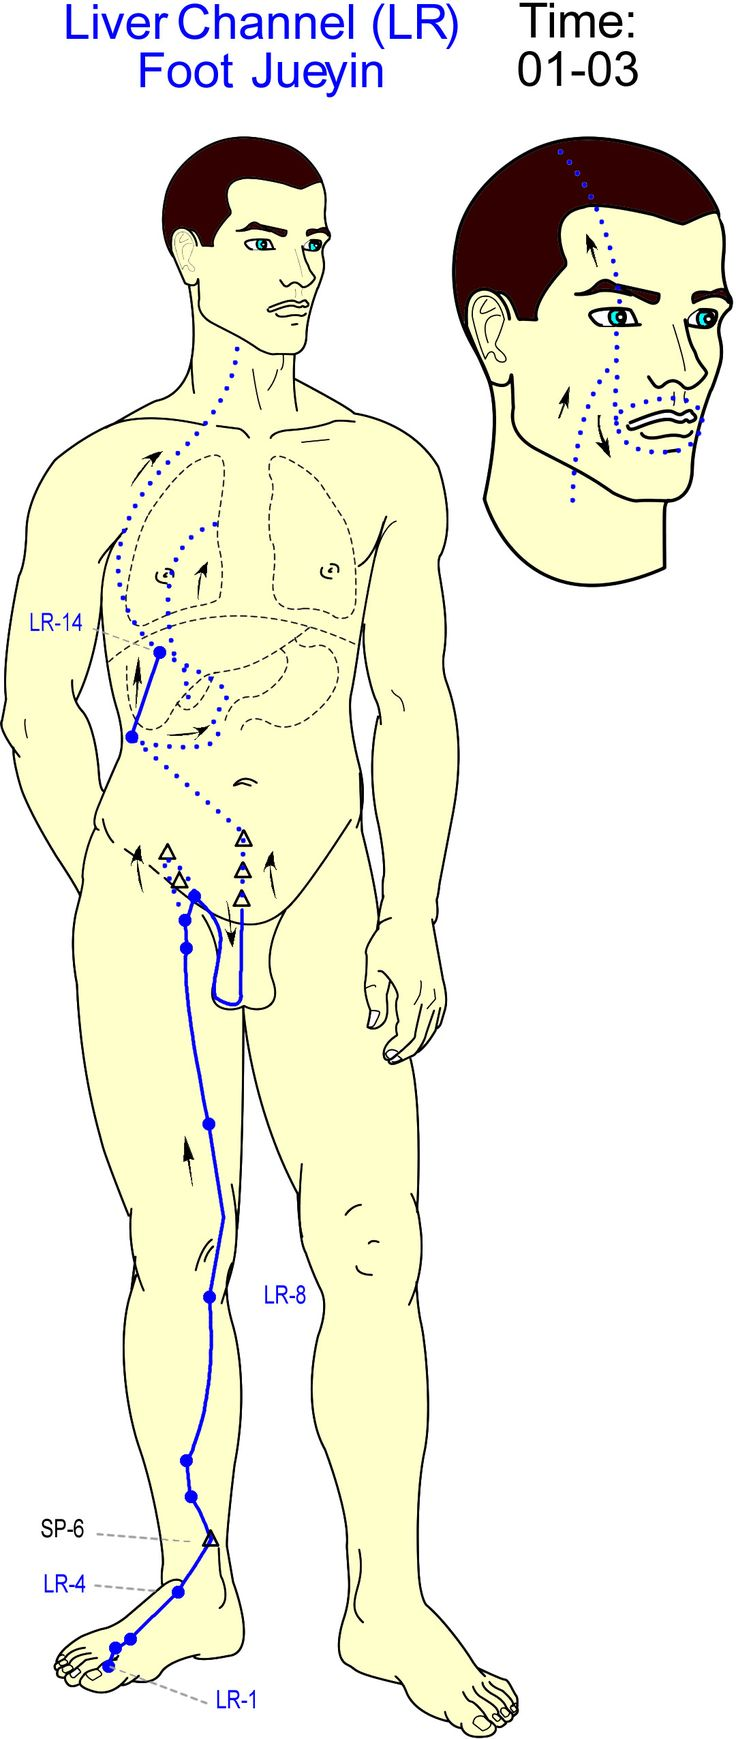 Liver Channel Repinned by www.academ.nl/ & www.medischeqigong.com #qigong #acupuncture #health